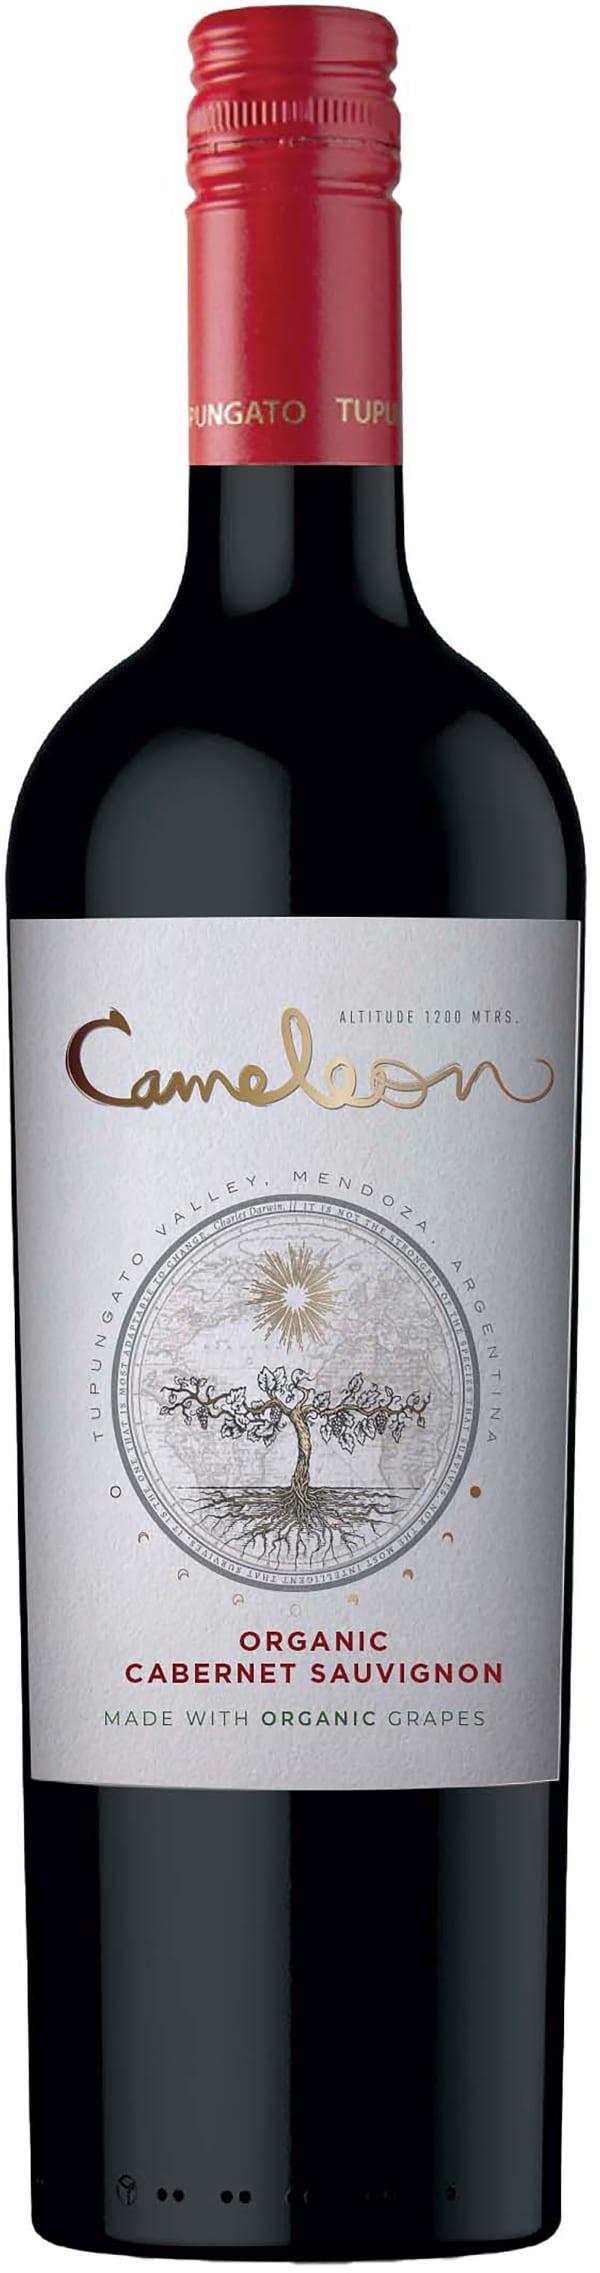 Cameleon Organic Cabernet Sauvignon 2019